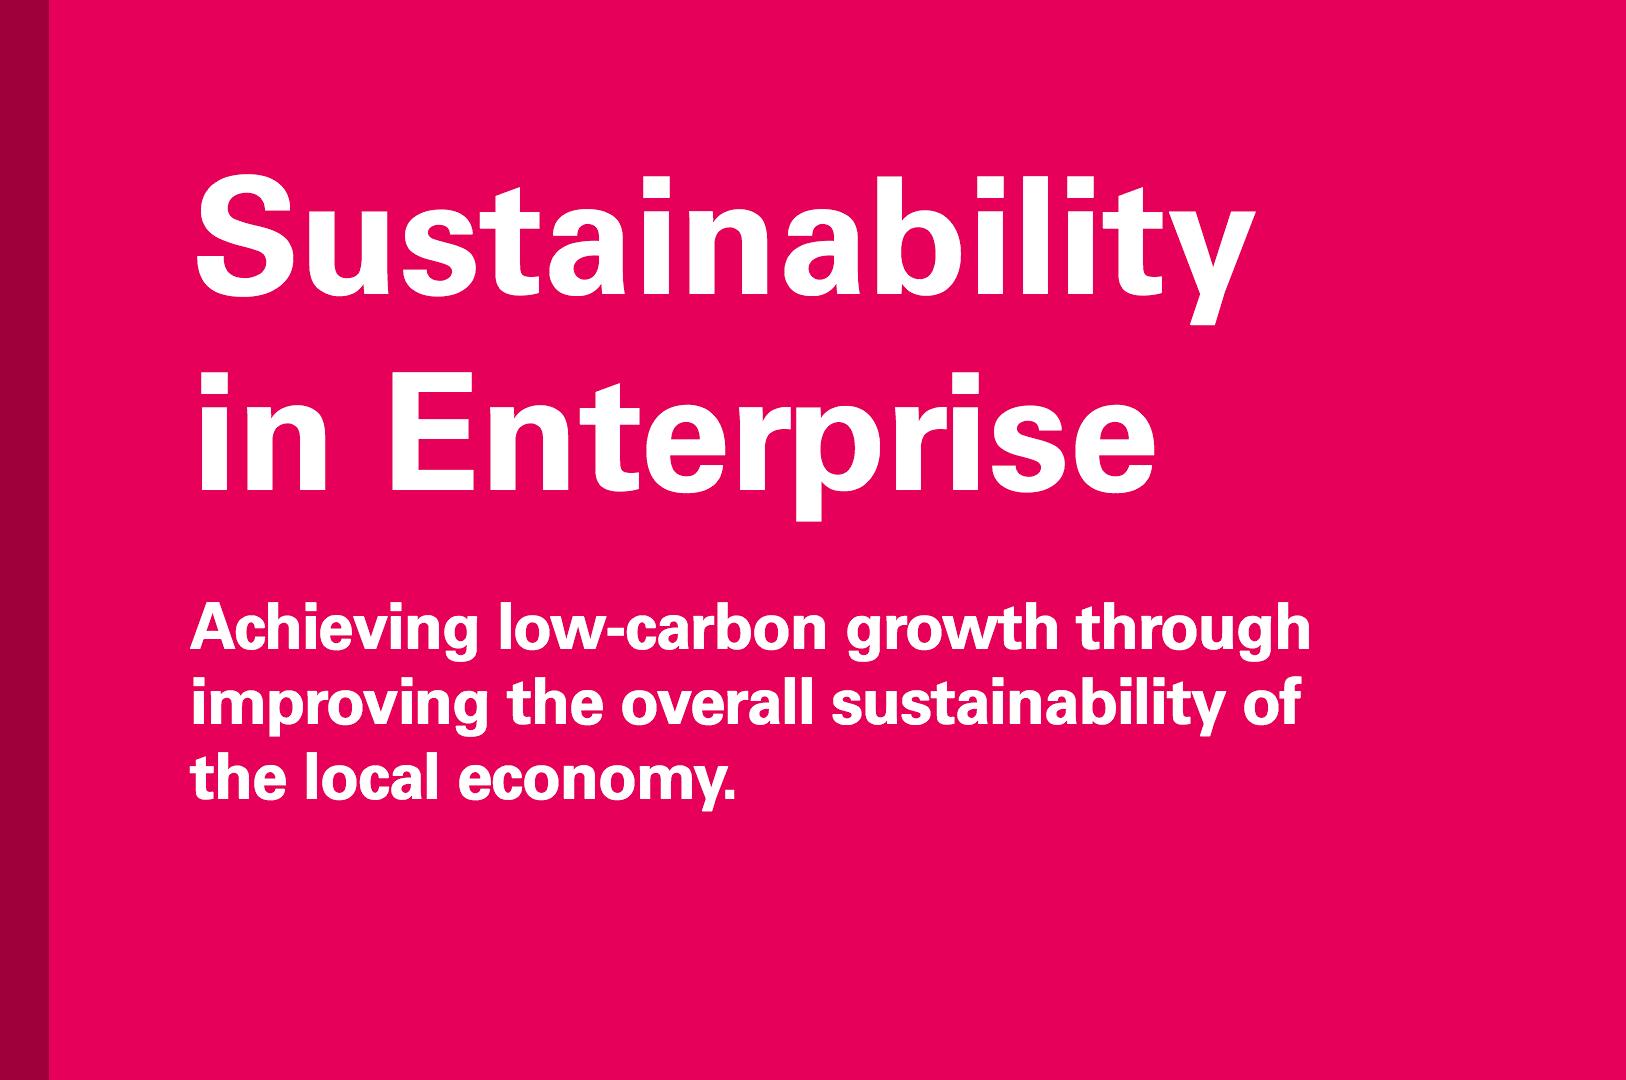 Sustainability in Enterprise